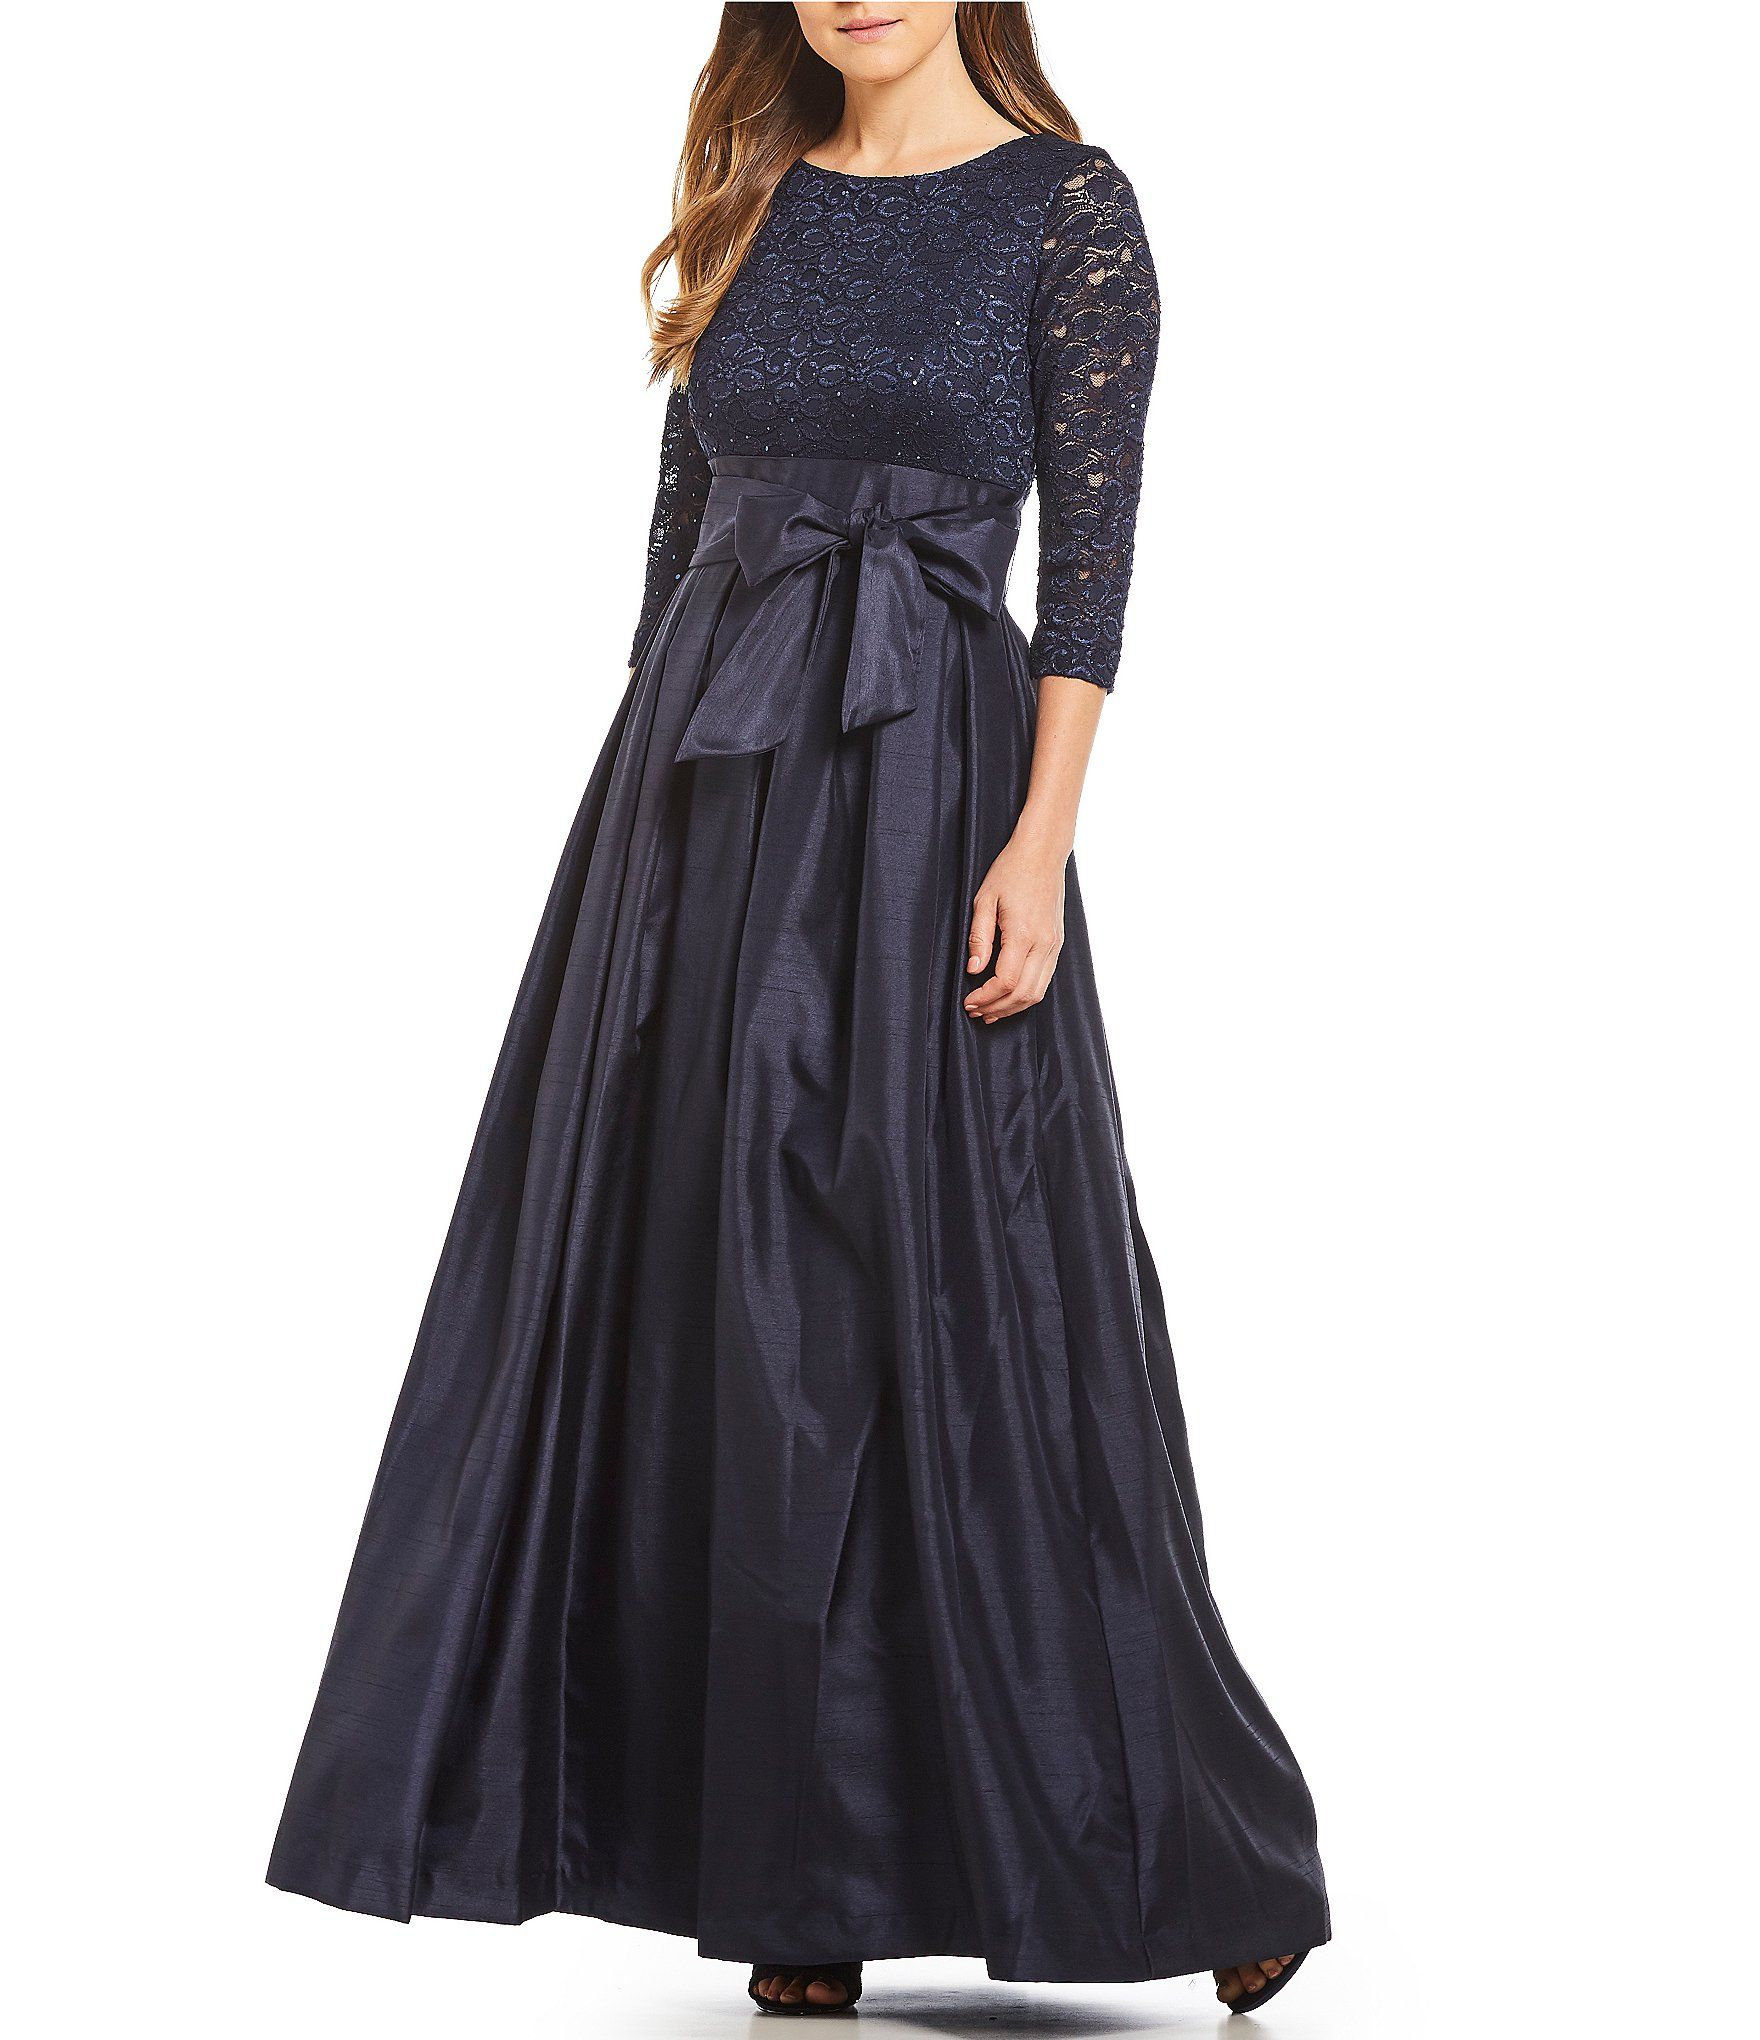 cf3b533ca4b6 Jessica Howard Pleated Skirt Bow Tie Waist Ball Gown #Dillards ...